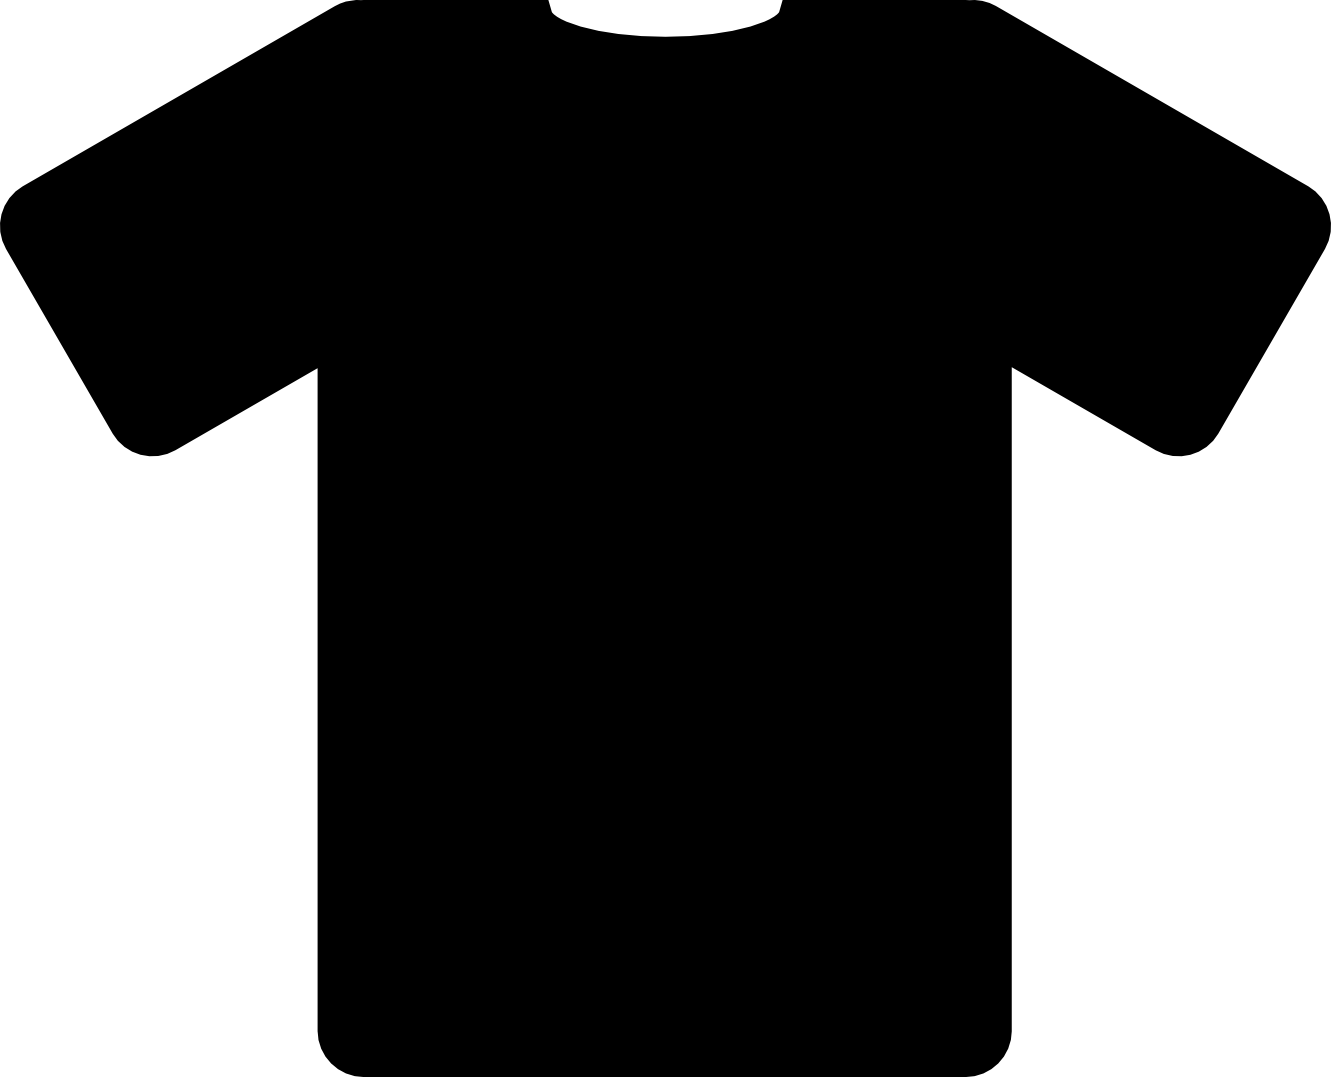 Black T Shirt Png Image